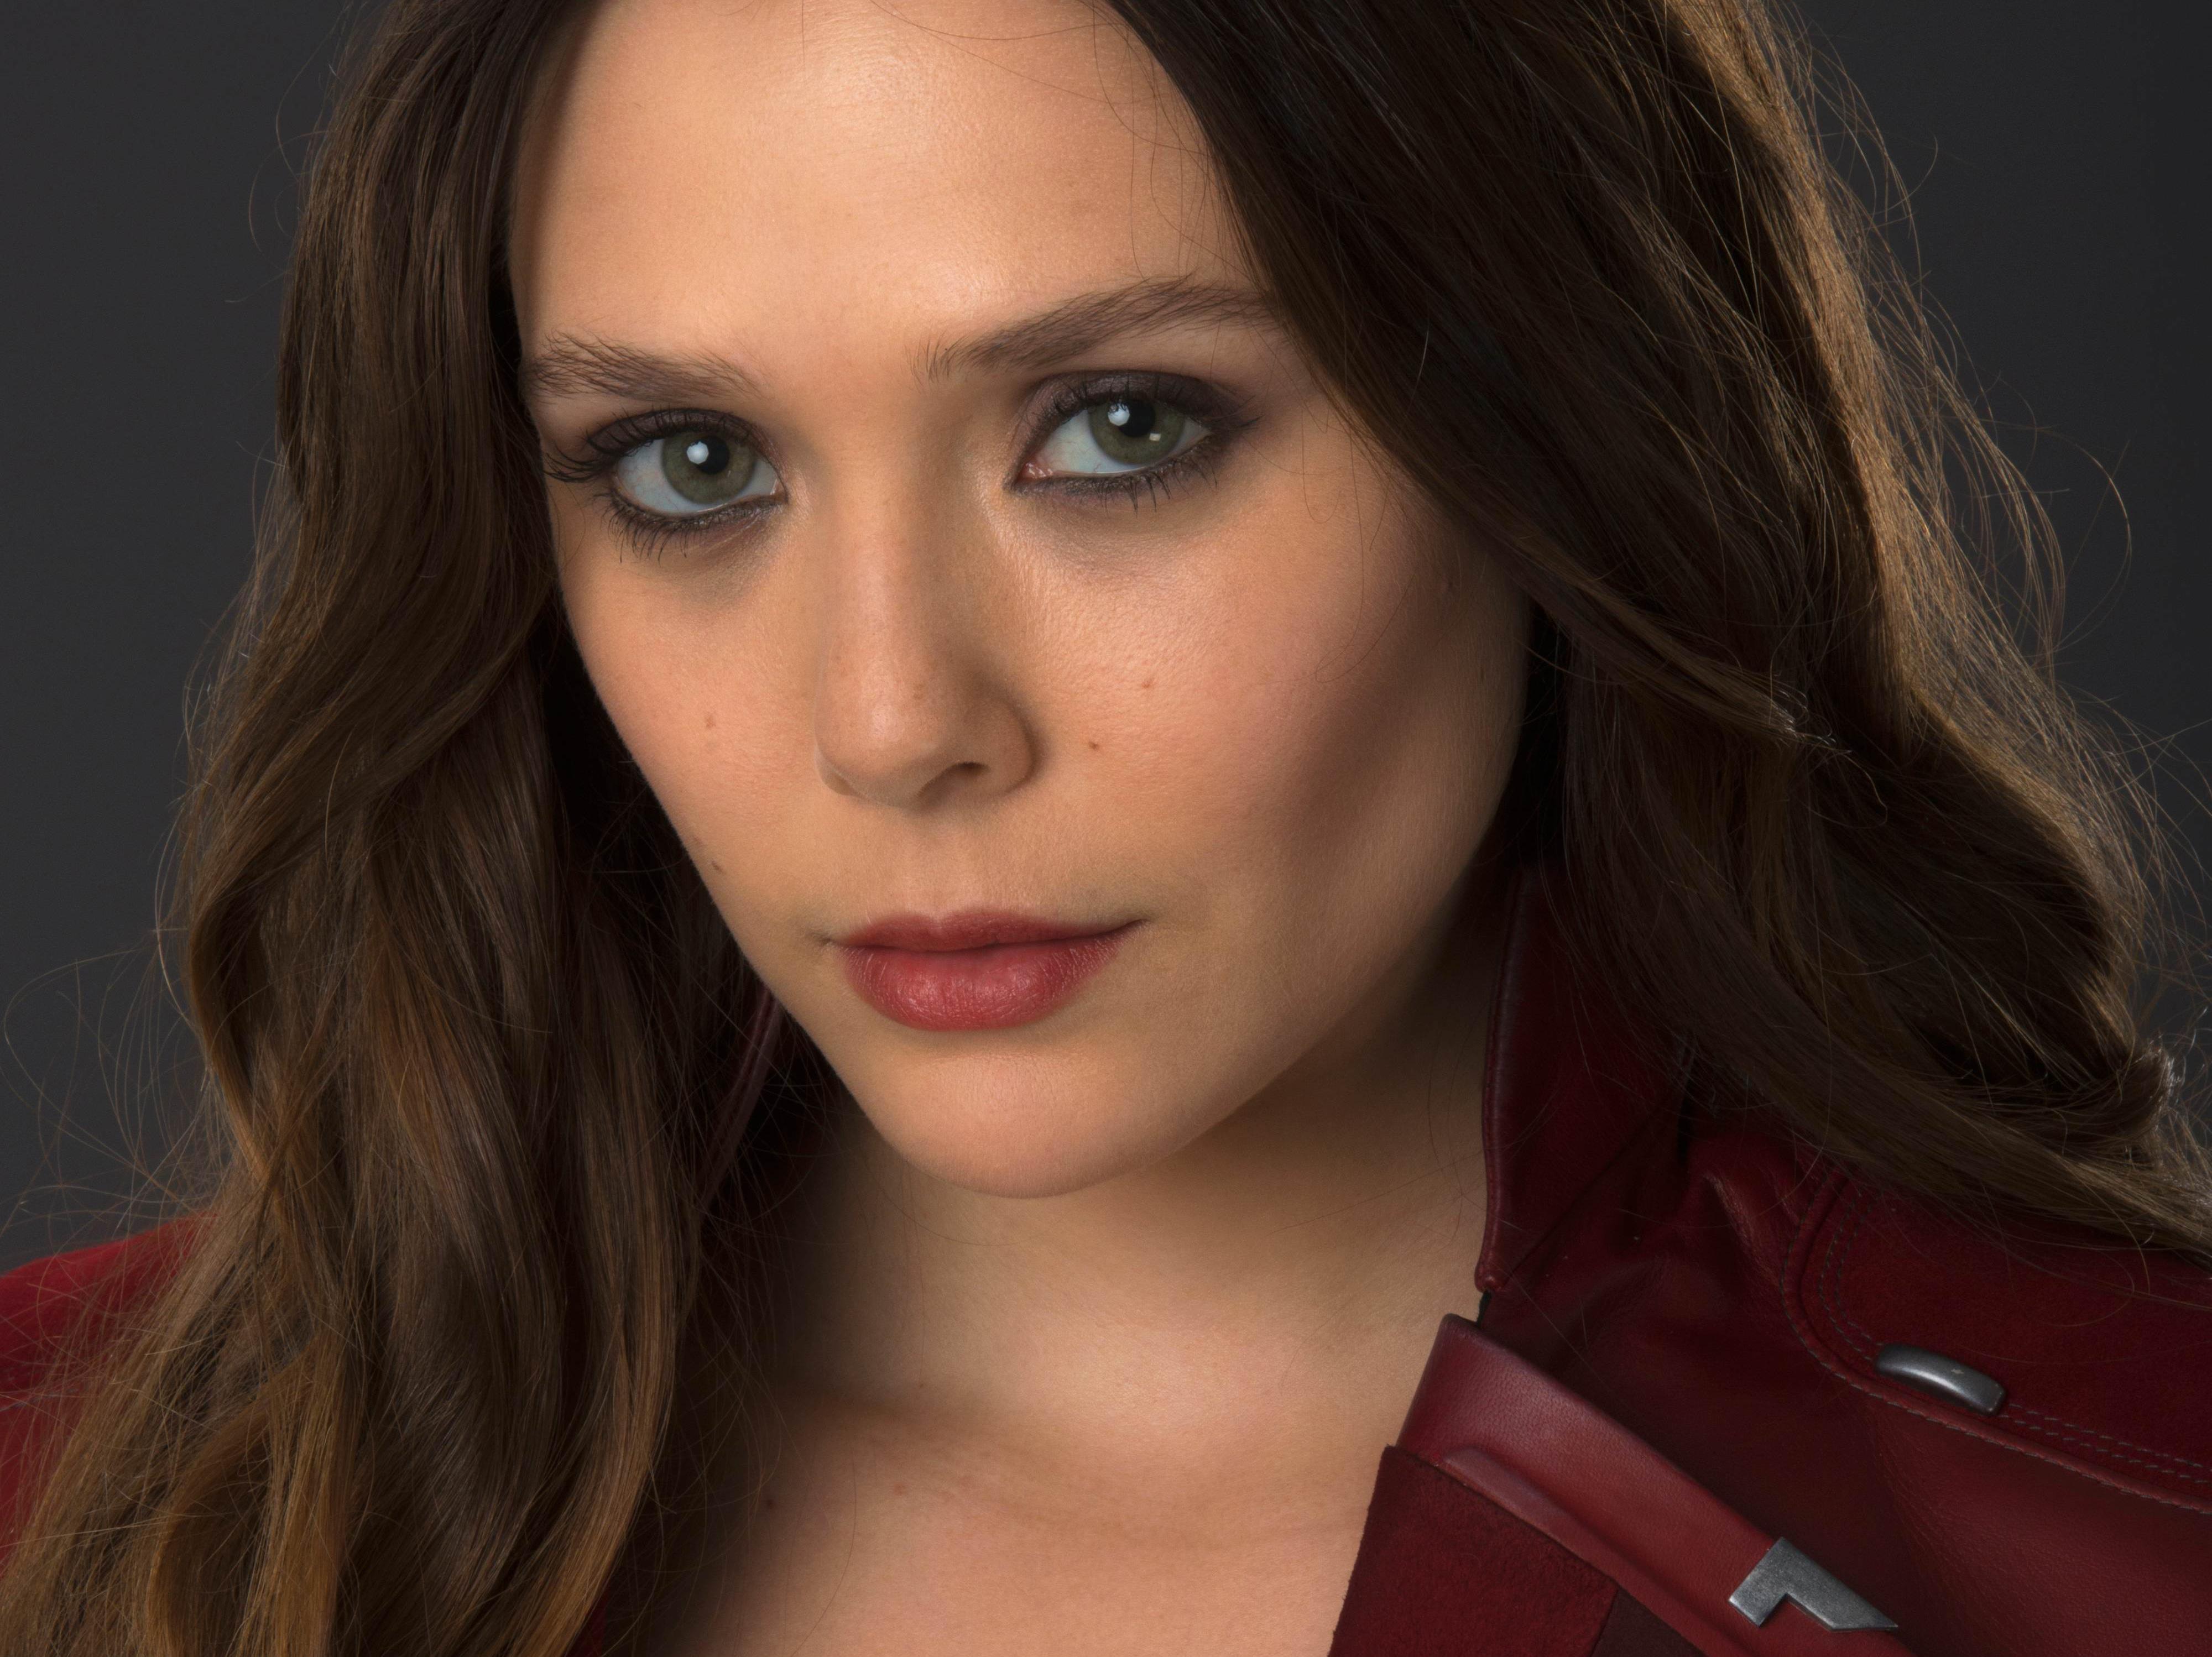 Elizabeth Olsen 4k 2018, HD Celebrities, 4k Wallpapers